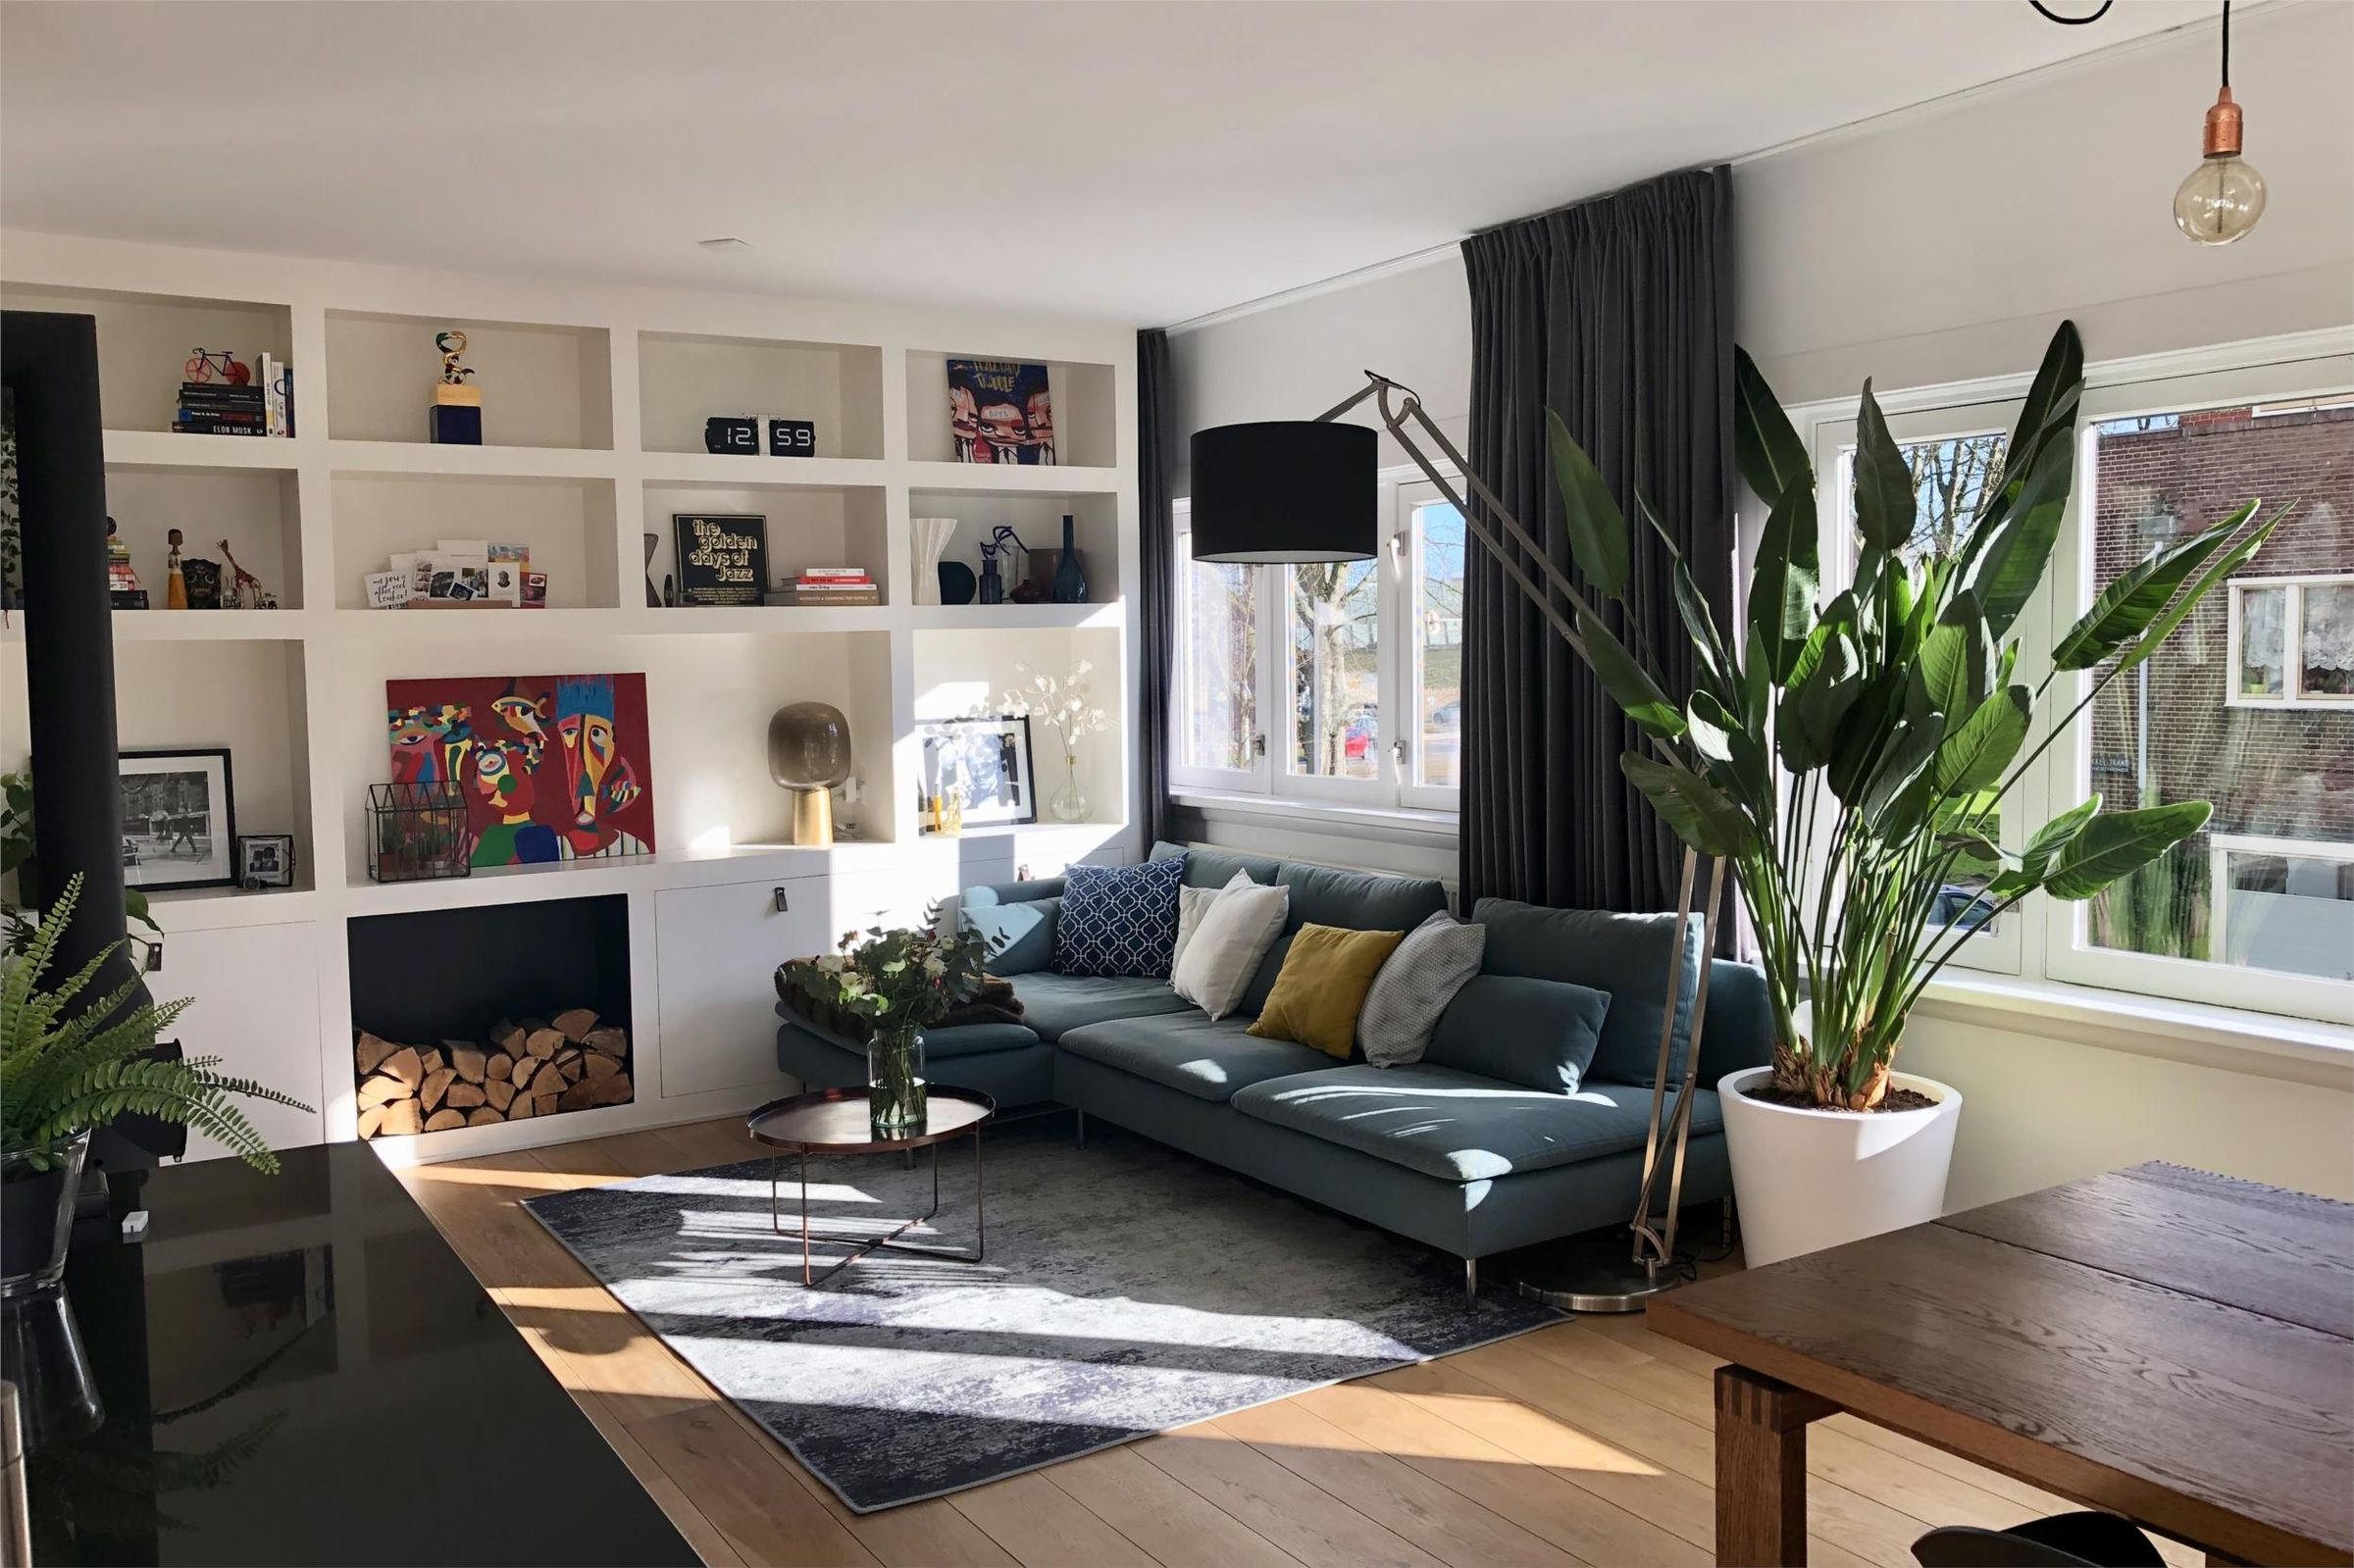 Middenweg 510, Amsterdam